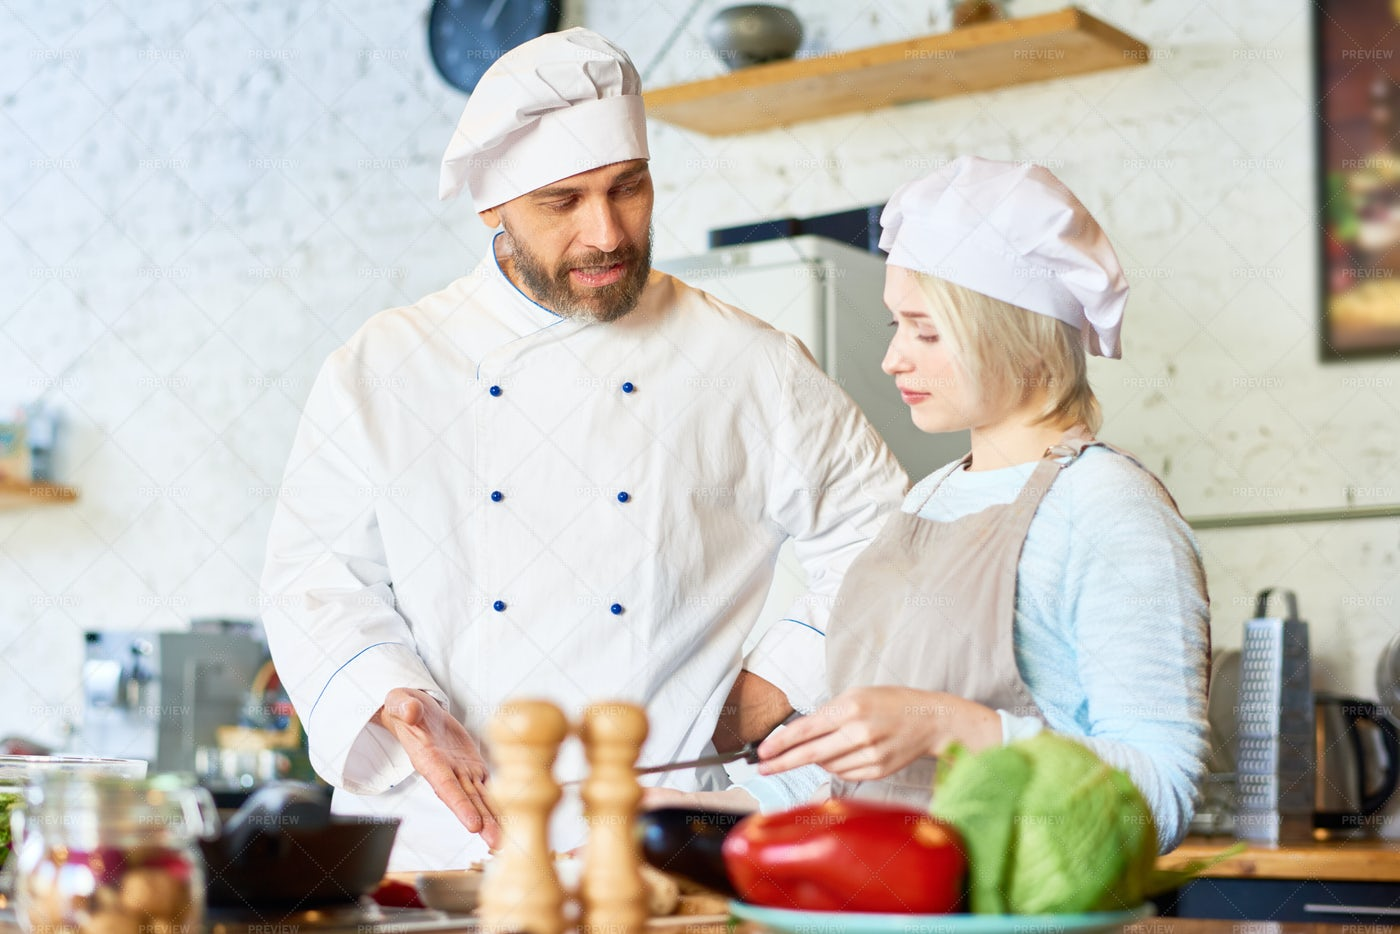 Teaching Cooking: Stock Photos